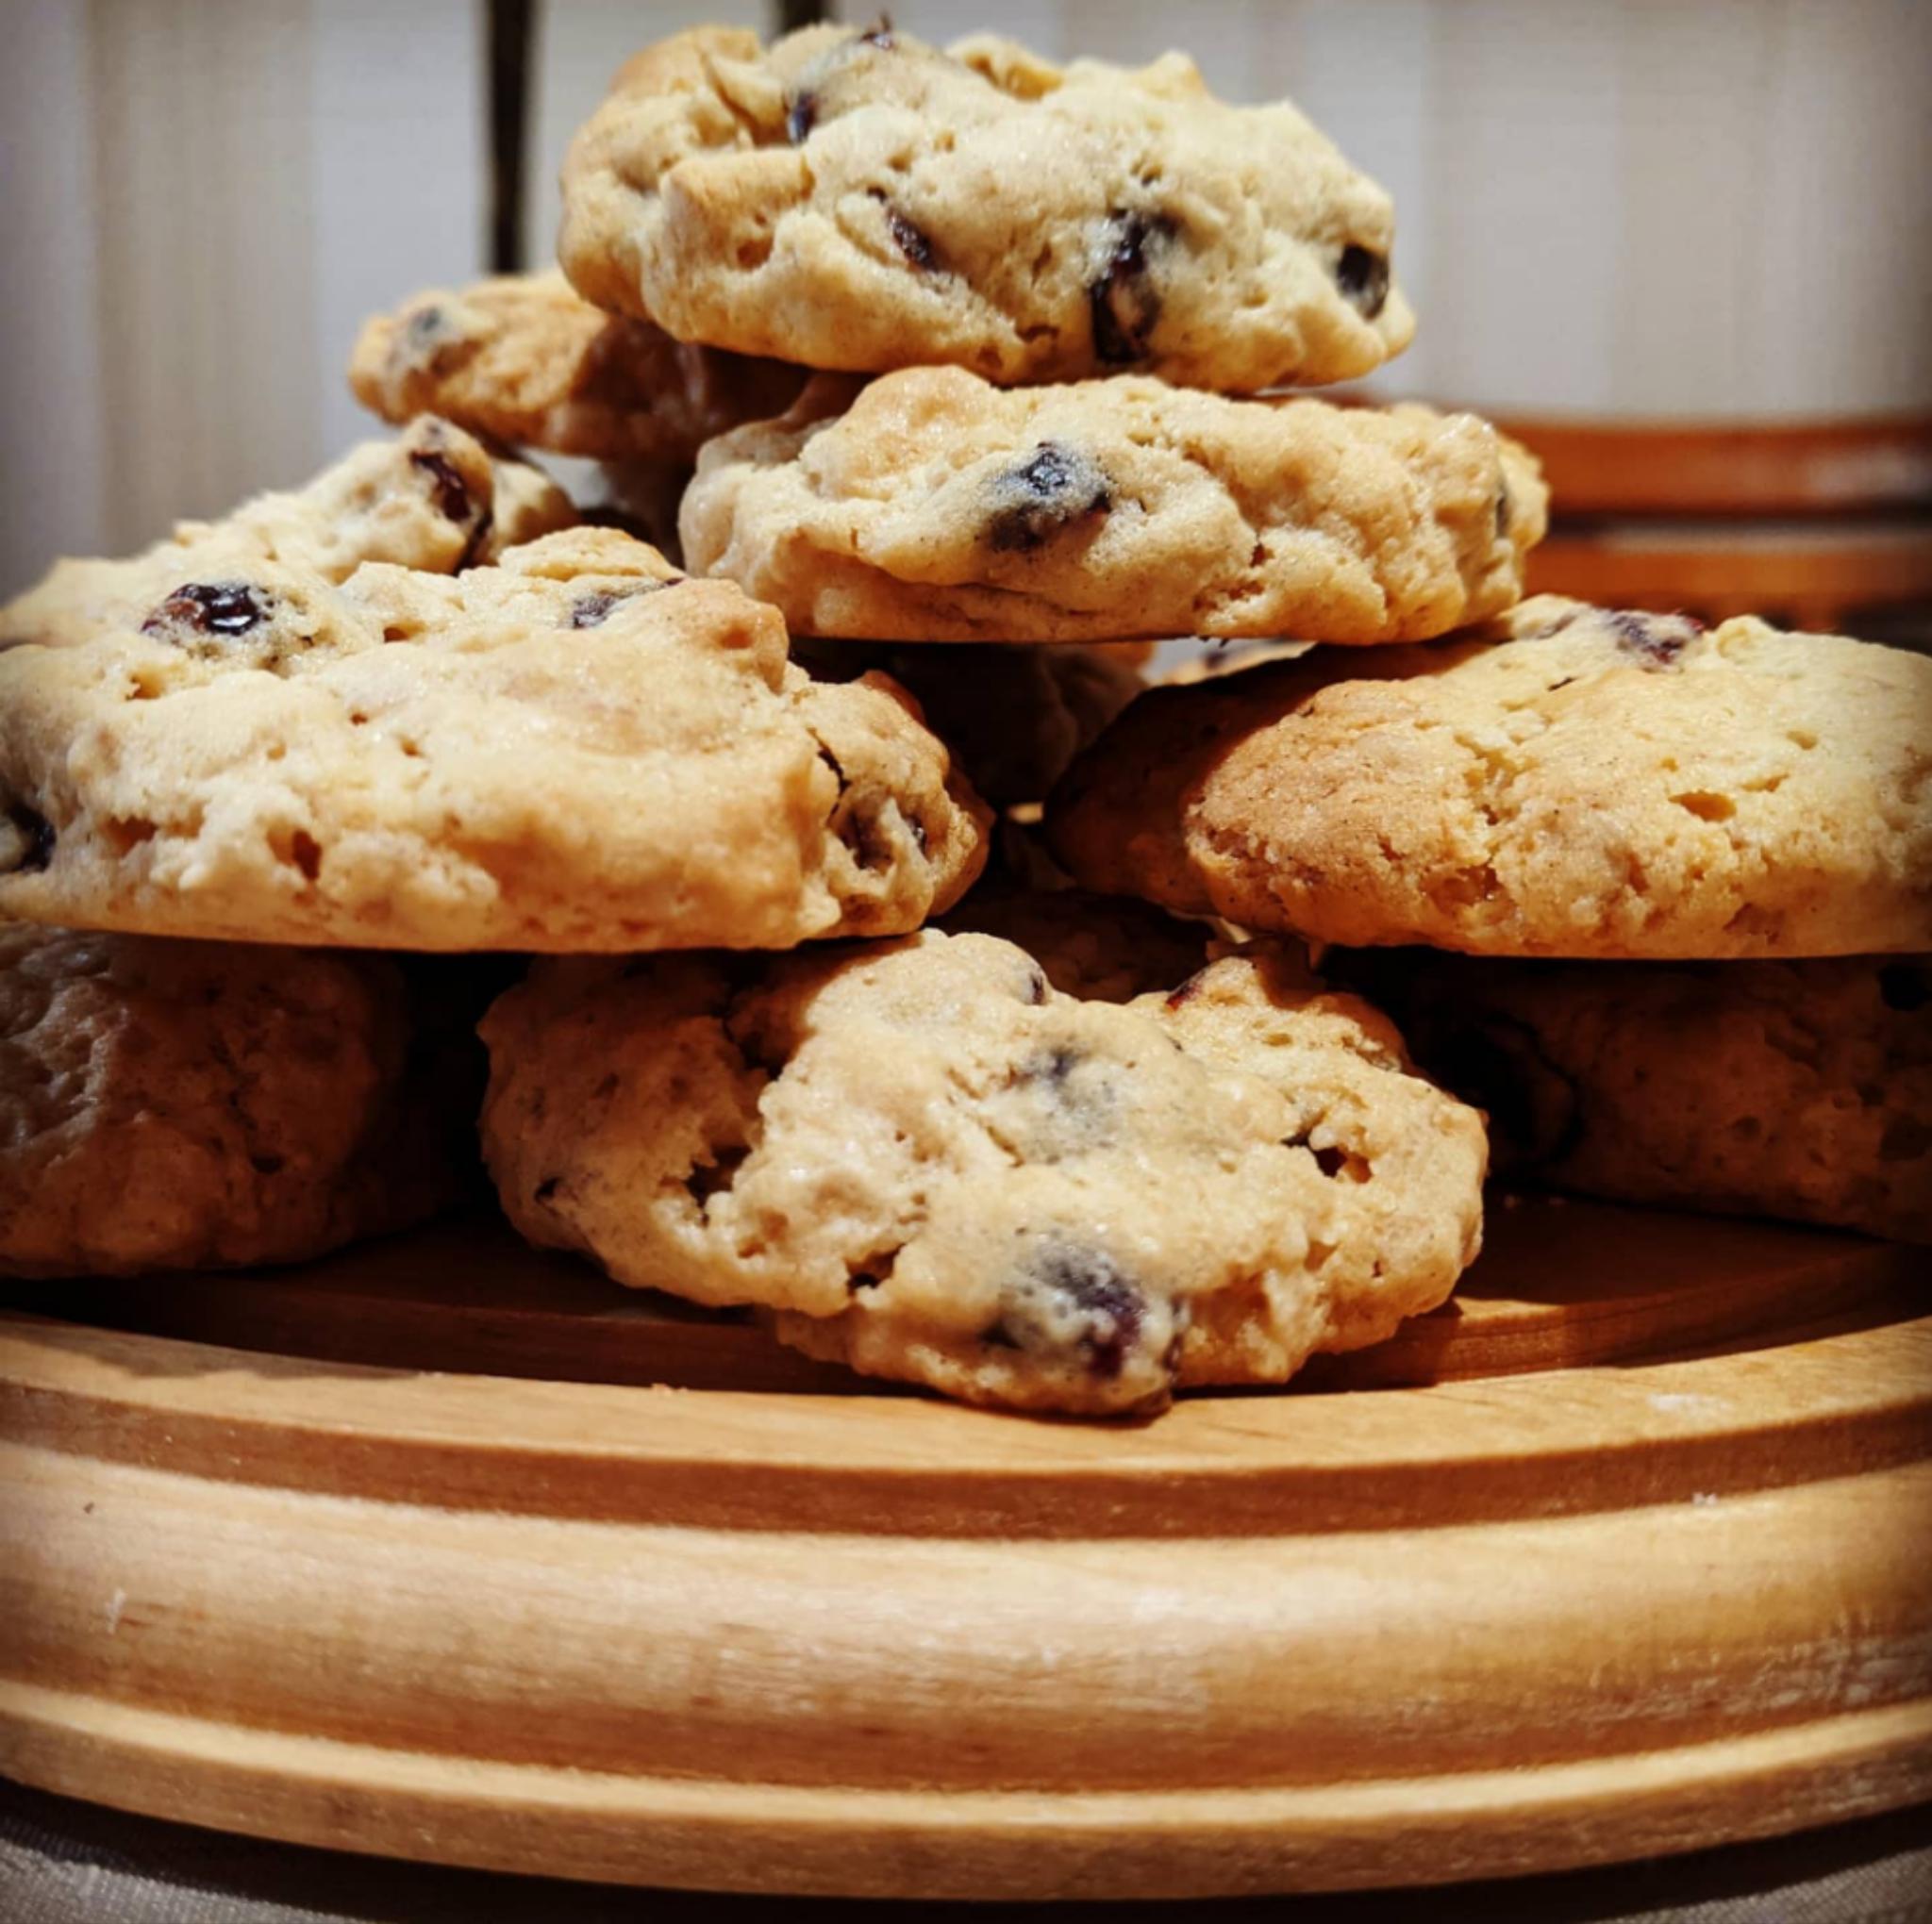 Craisin & White Choc Oatmeal Cookies